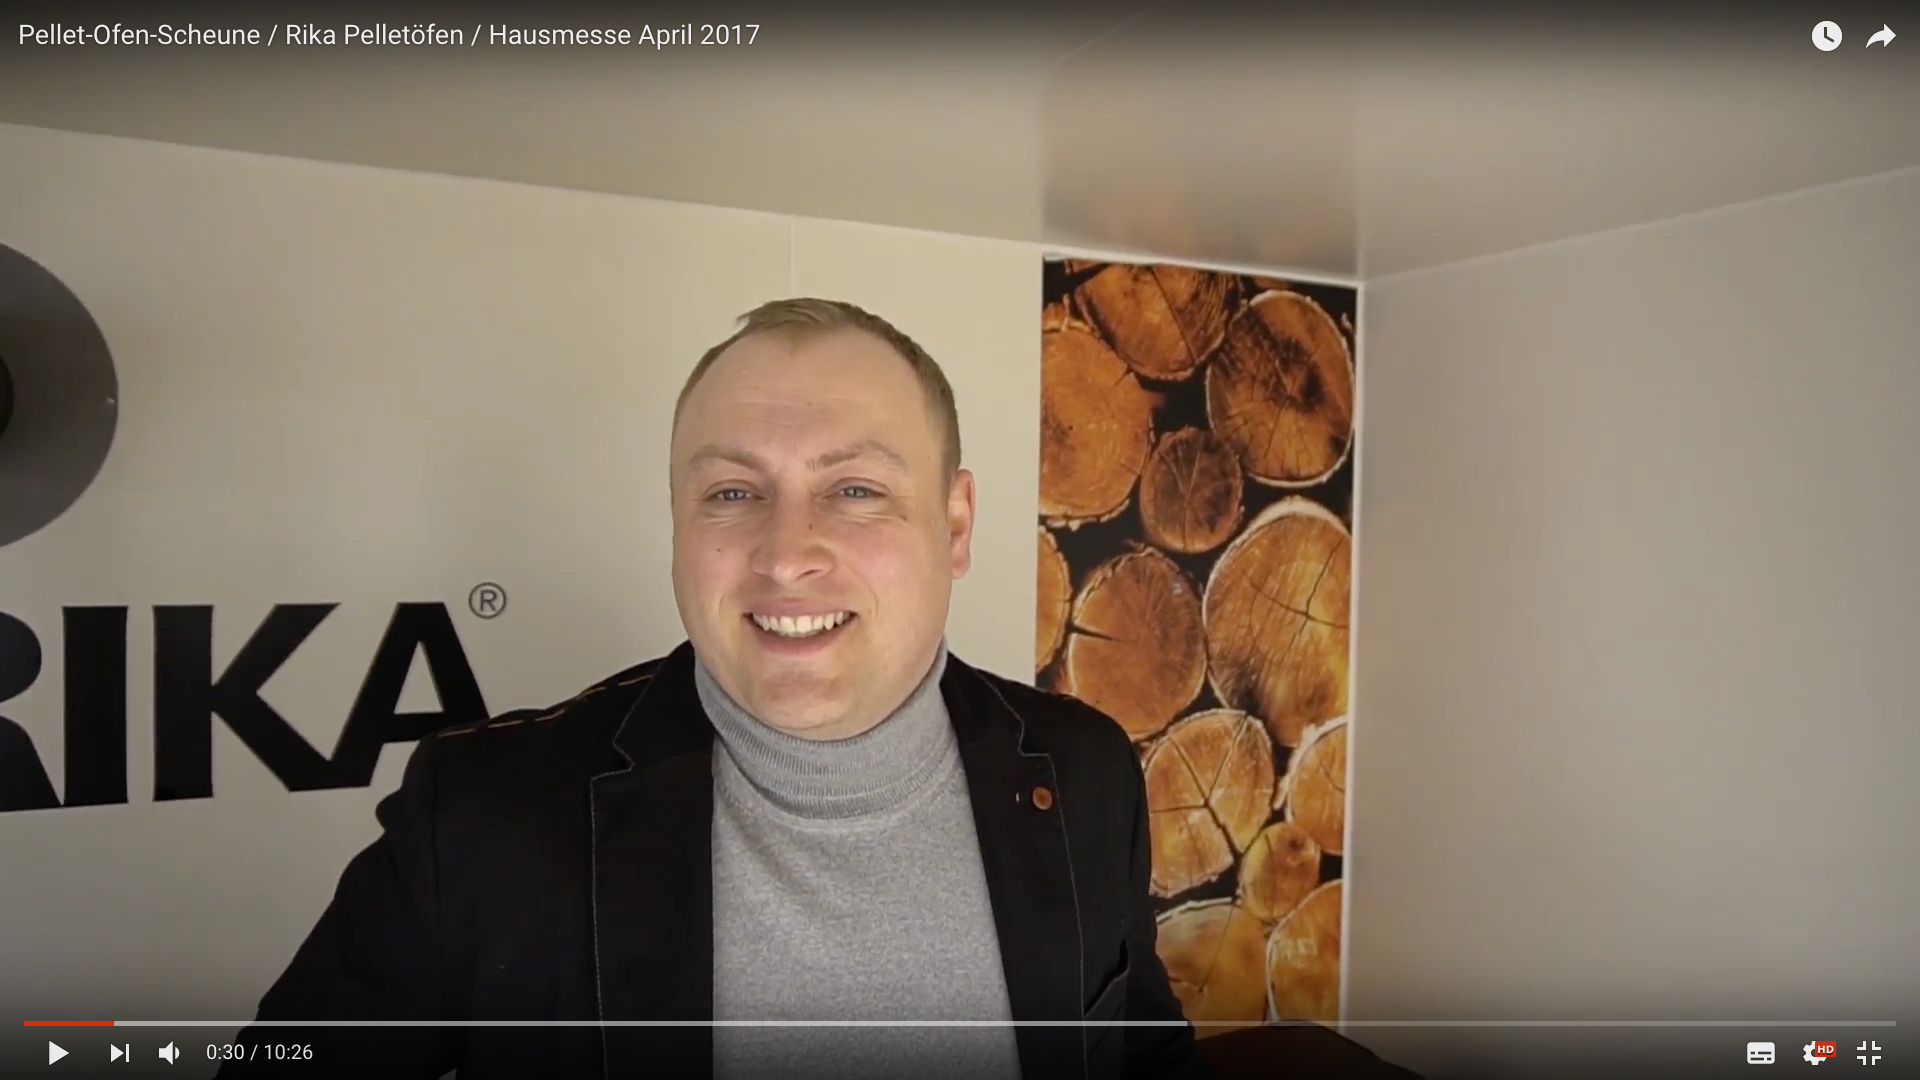 2017 Pellet-Ofen-Scheune : Rika Pelletöfen : Hausmesse Tim Lang_MSM_MEDIEN_SAAR_MOSEL_SAARLAND_FERNSEHEN_1_ED_SAAR